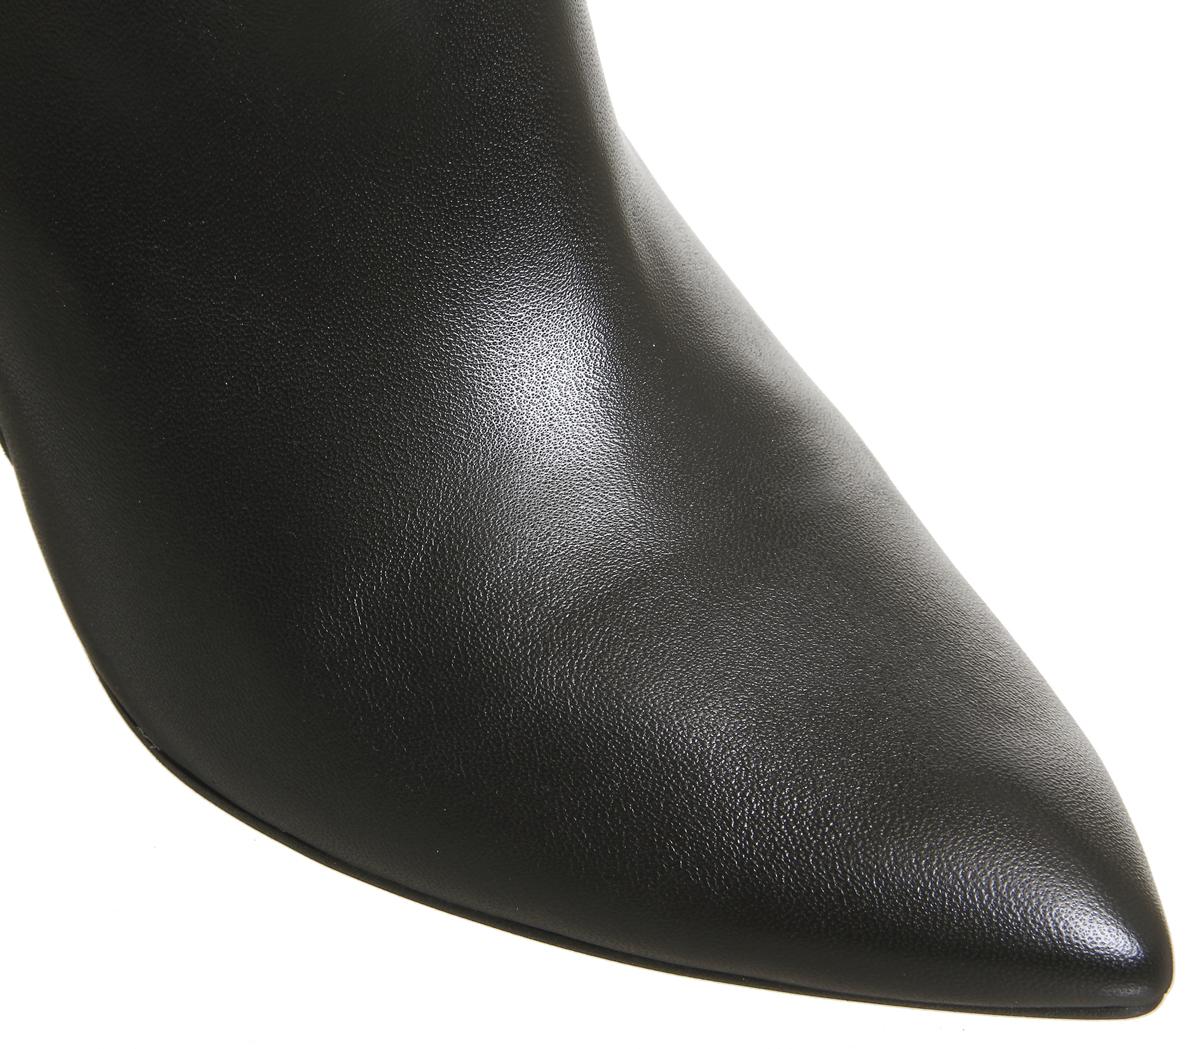 Damenschuhe Office LEATHER Keepsake Calf Stiefel BLACK LEATHER Office Stiefel 13a4cf